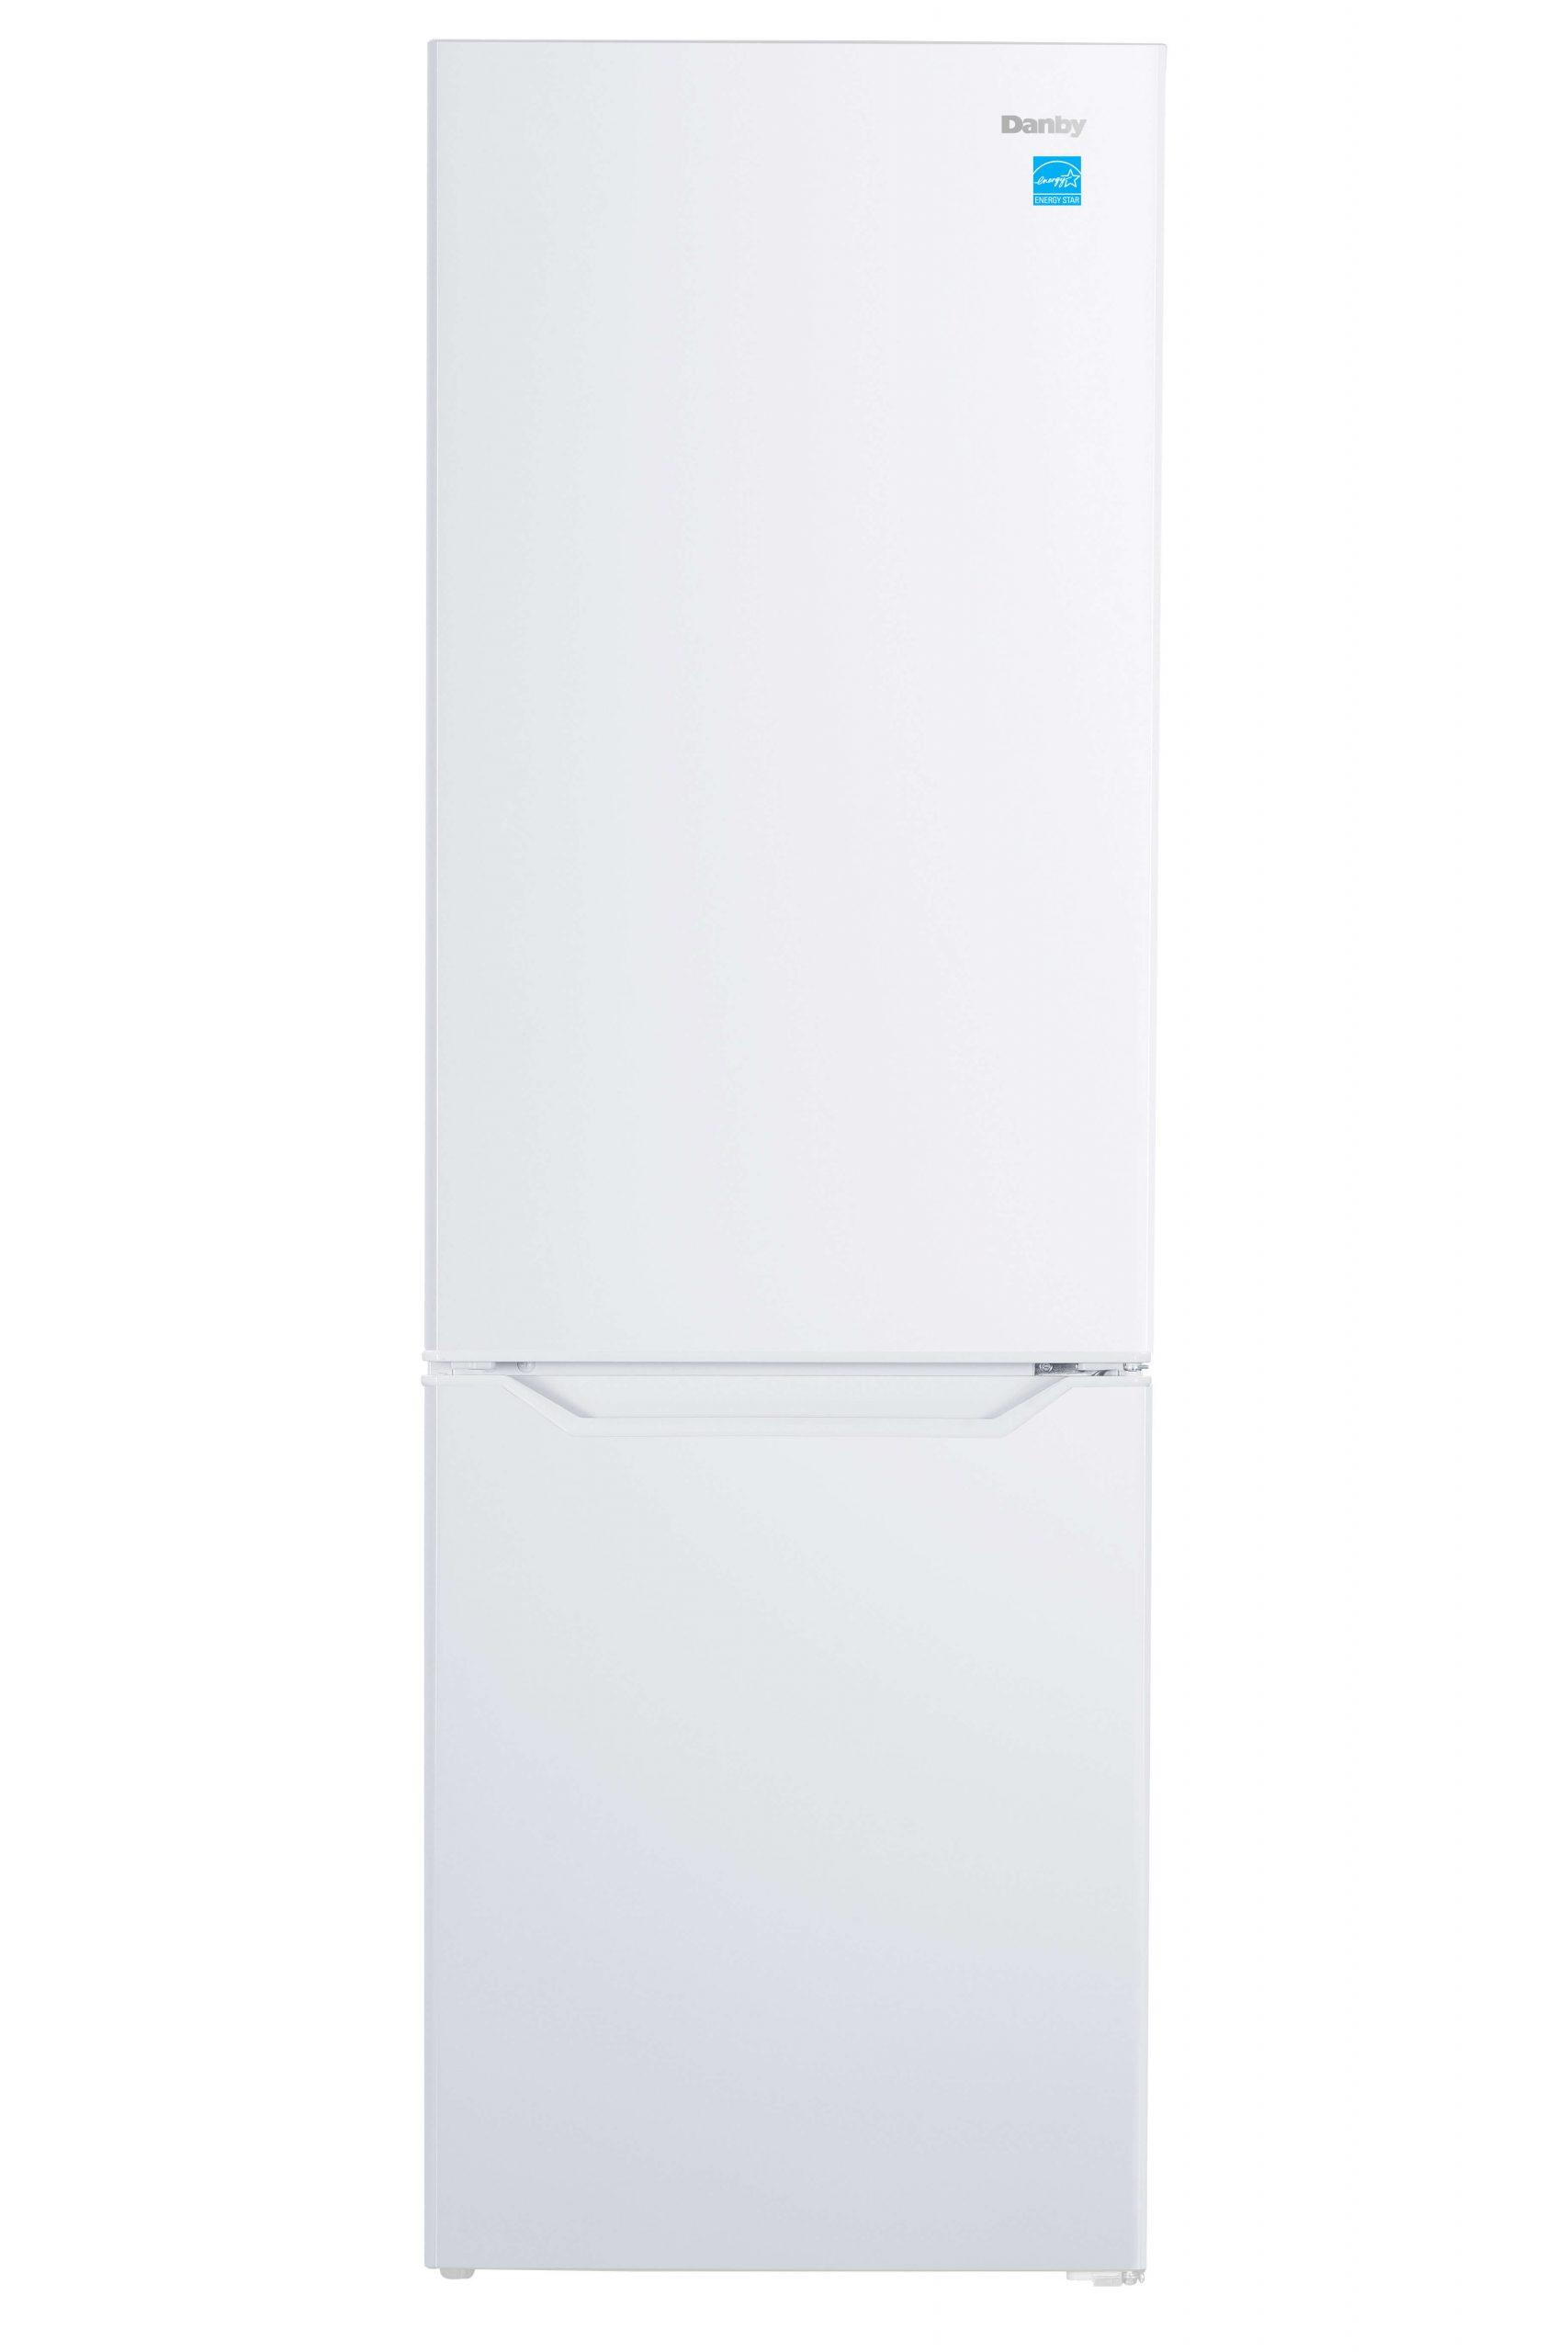 Danby 10 cu ft Bottom Mount Refrigerator